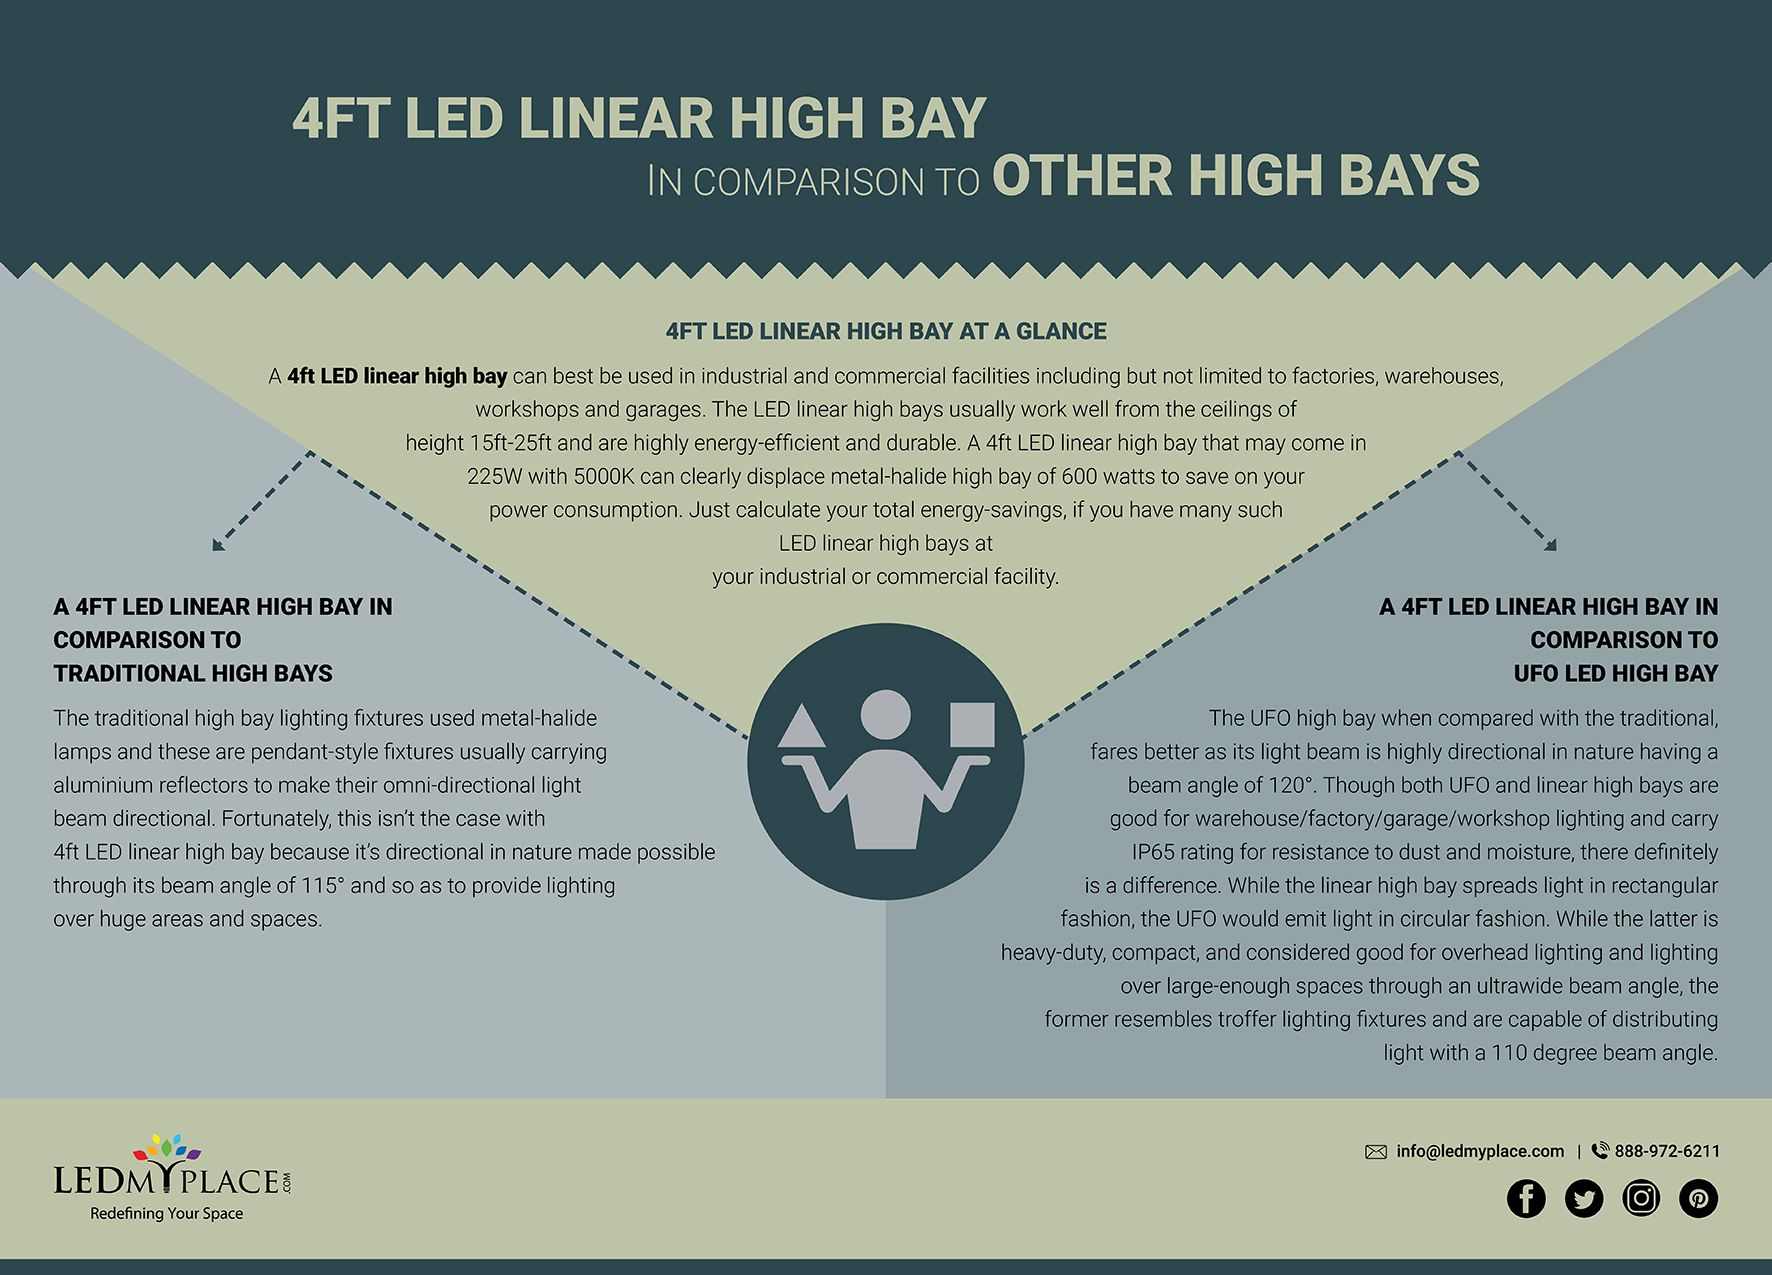 4ft Led Linear High Bay 225w 30150 Lumens And Dimmable Bay Lights Rgb Led Strip Lights Led Flood Lights